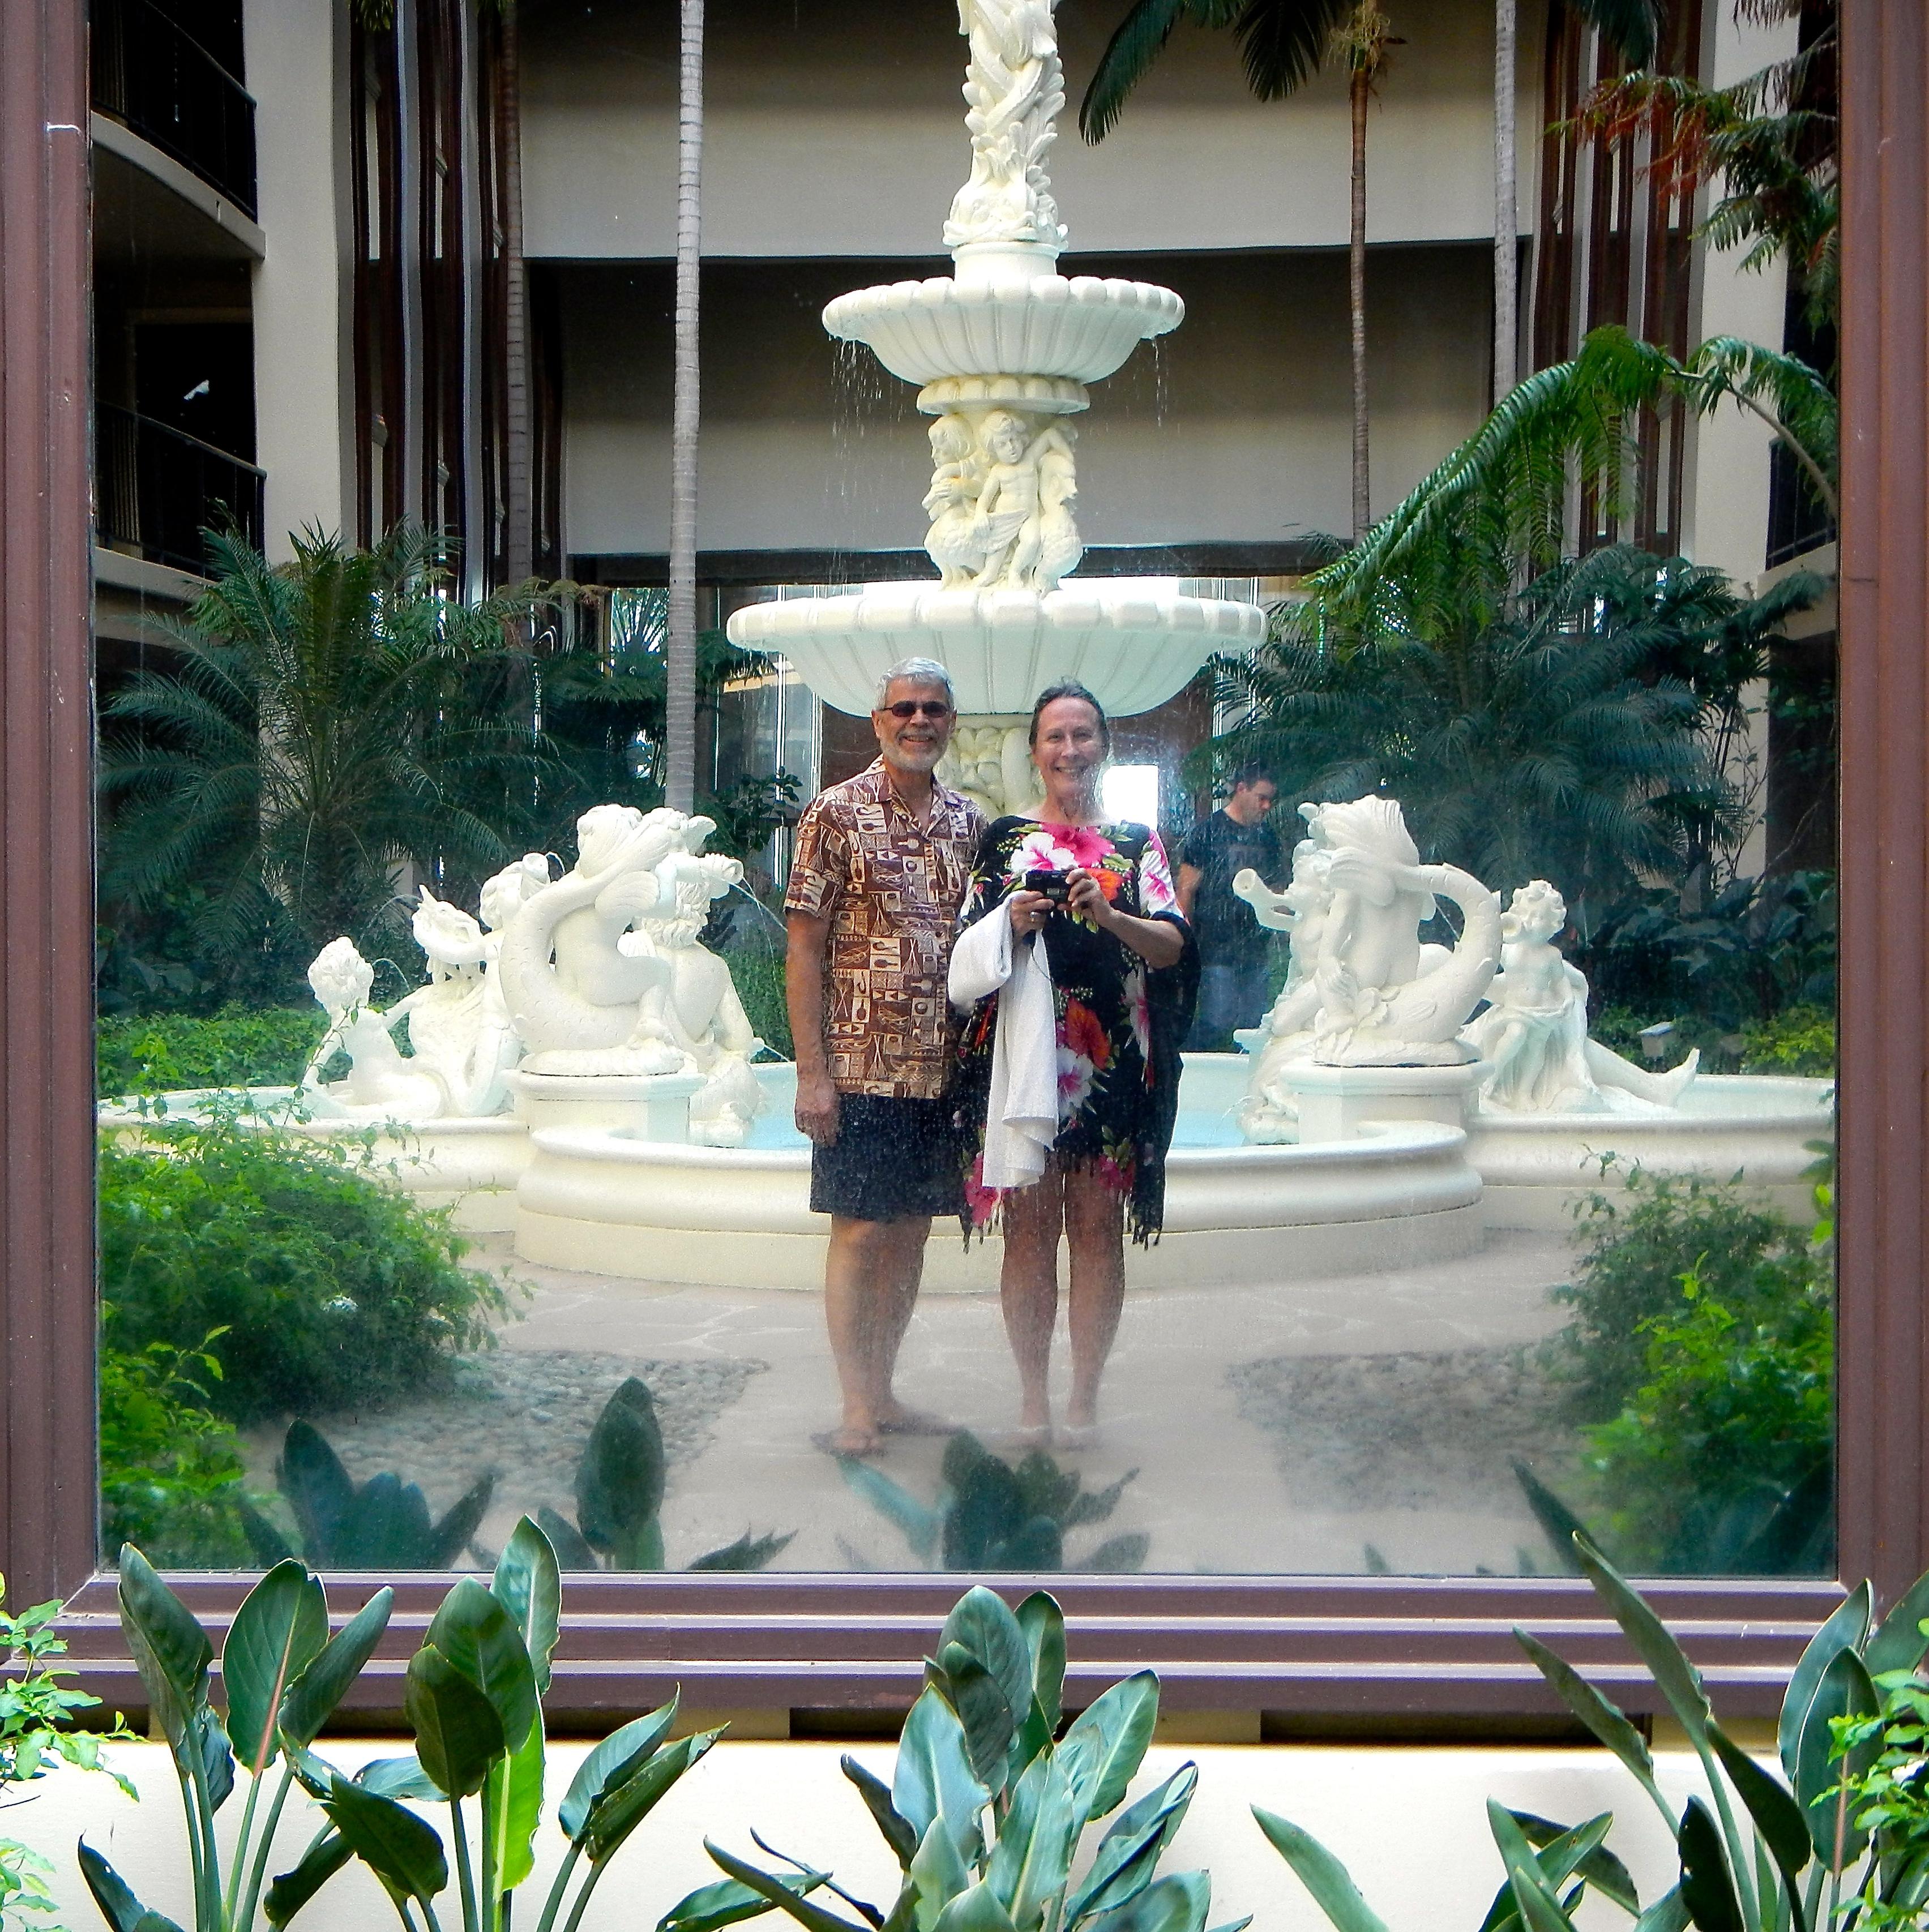 Picture through mirror at Hilton's Waikola Village Resort